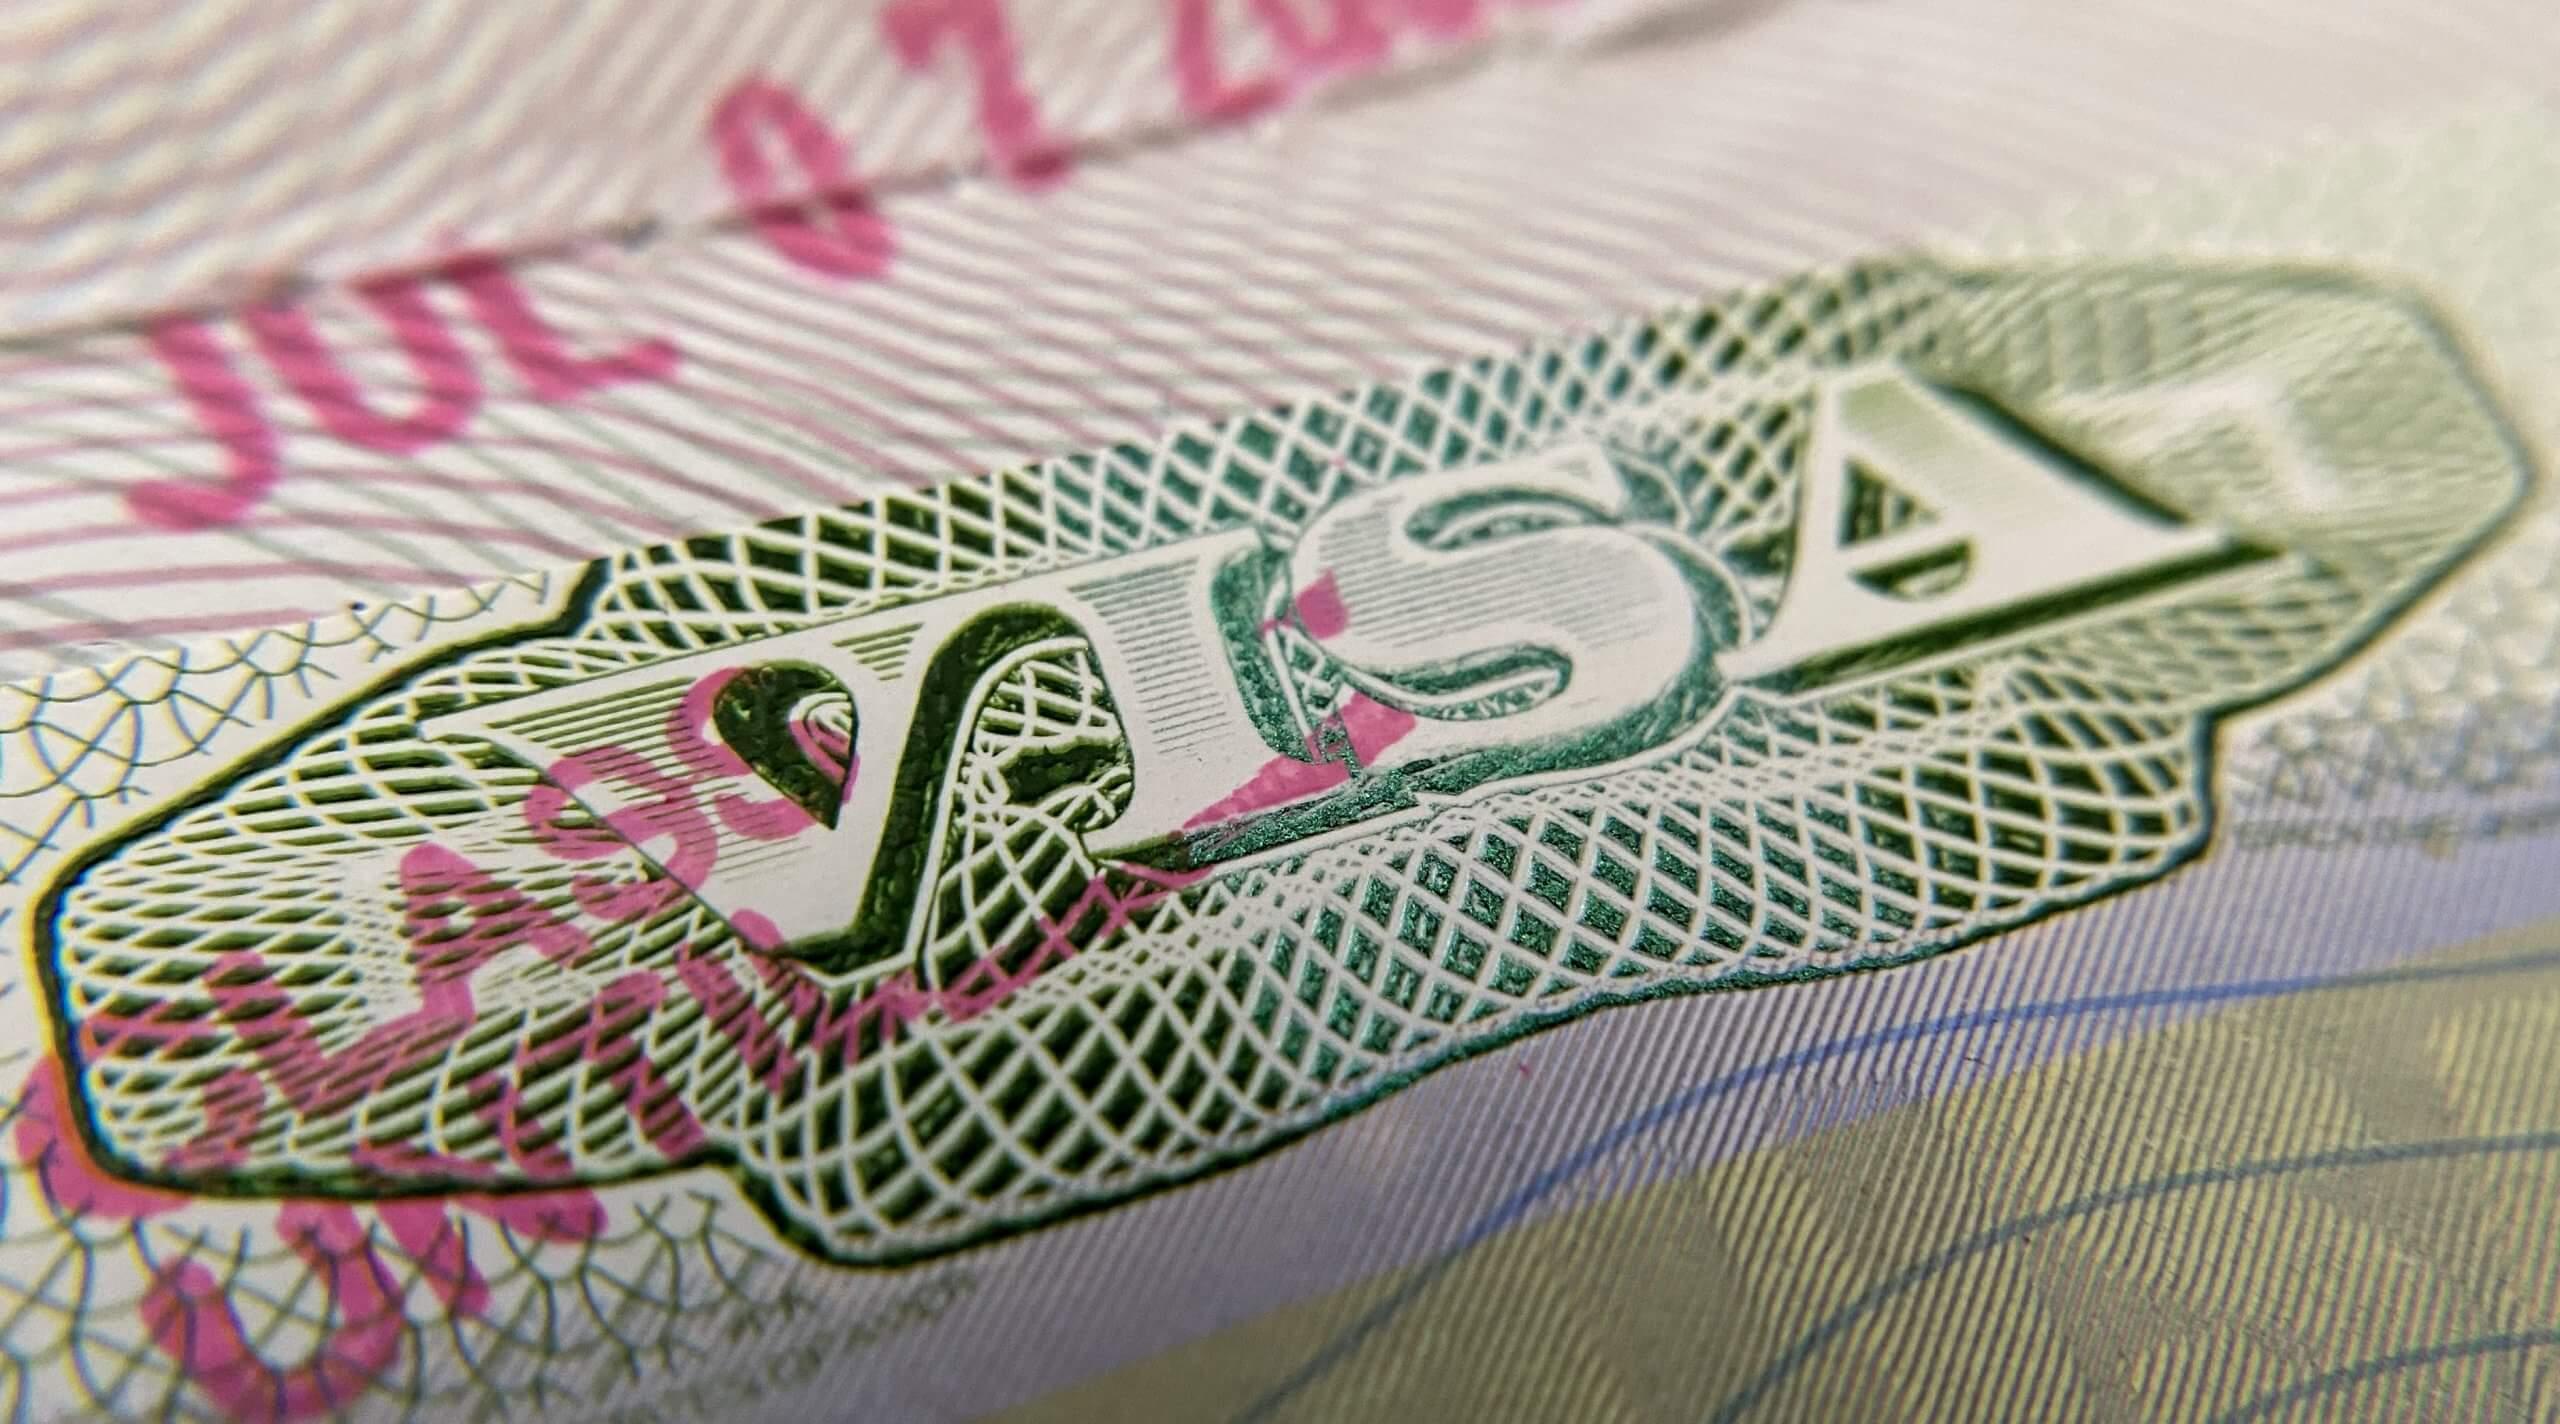 F-1 student visas